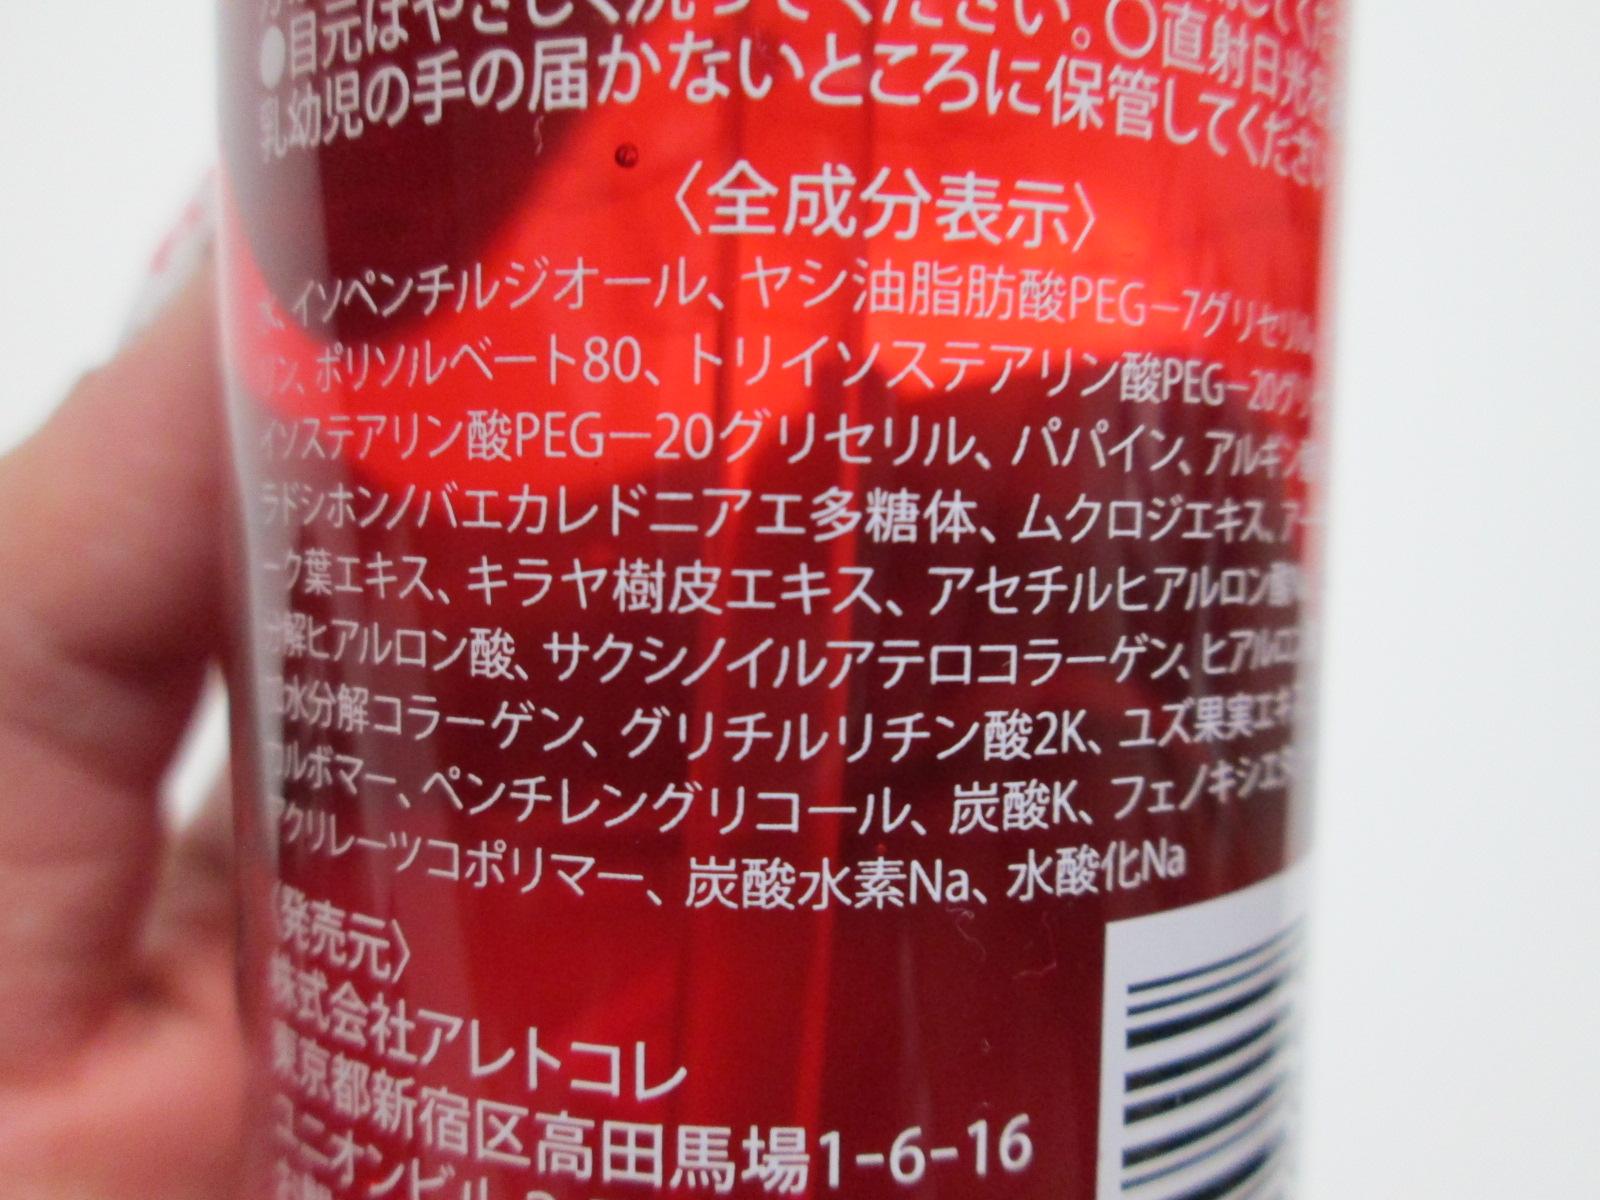 IMG_5455 ビオンセマジック (3)